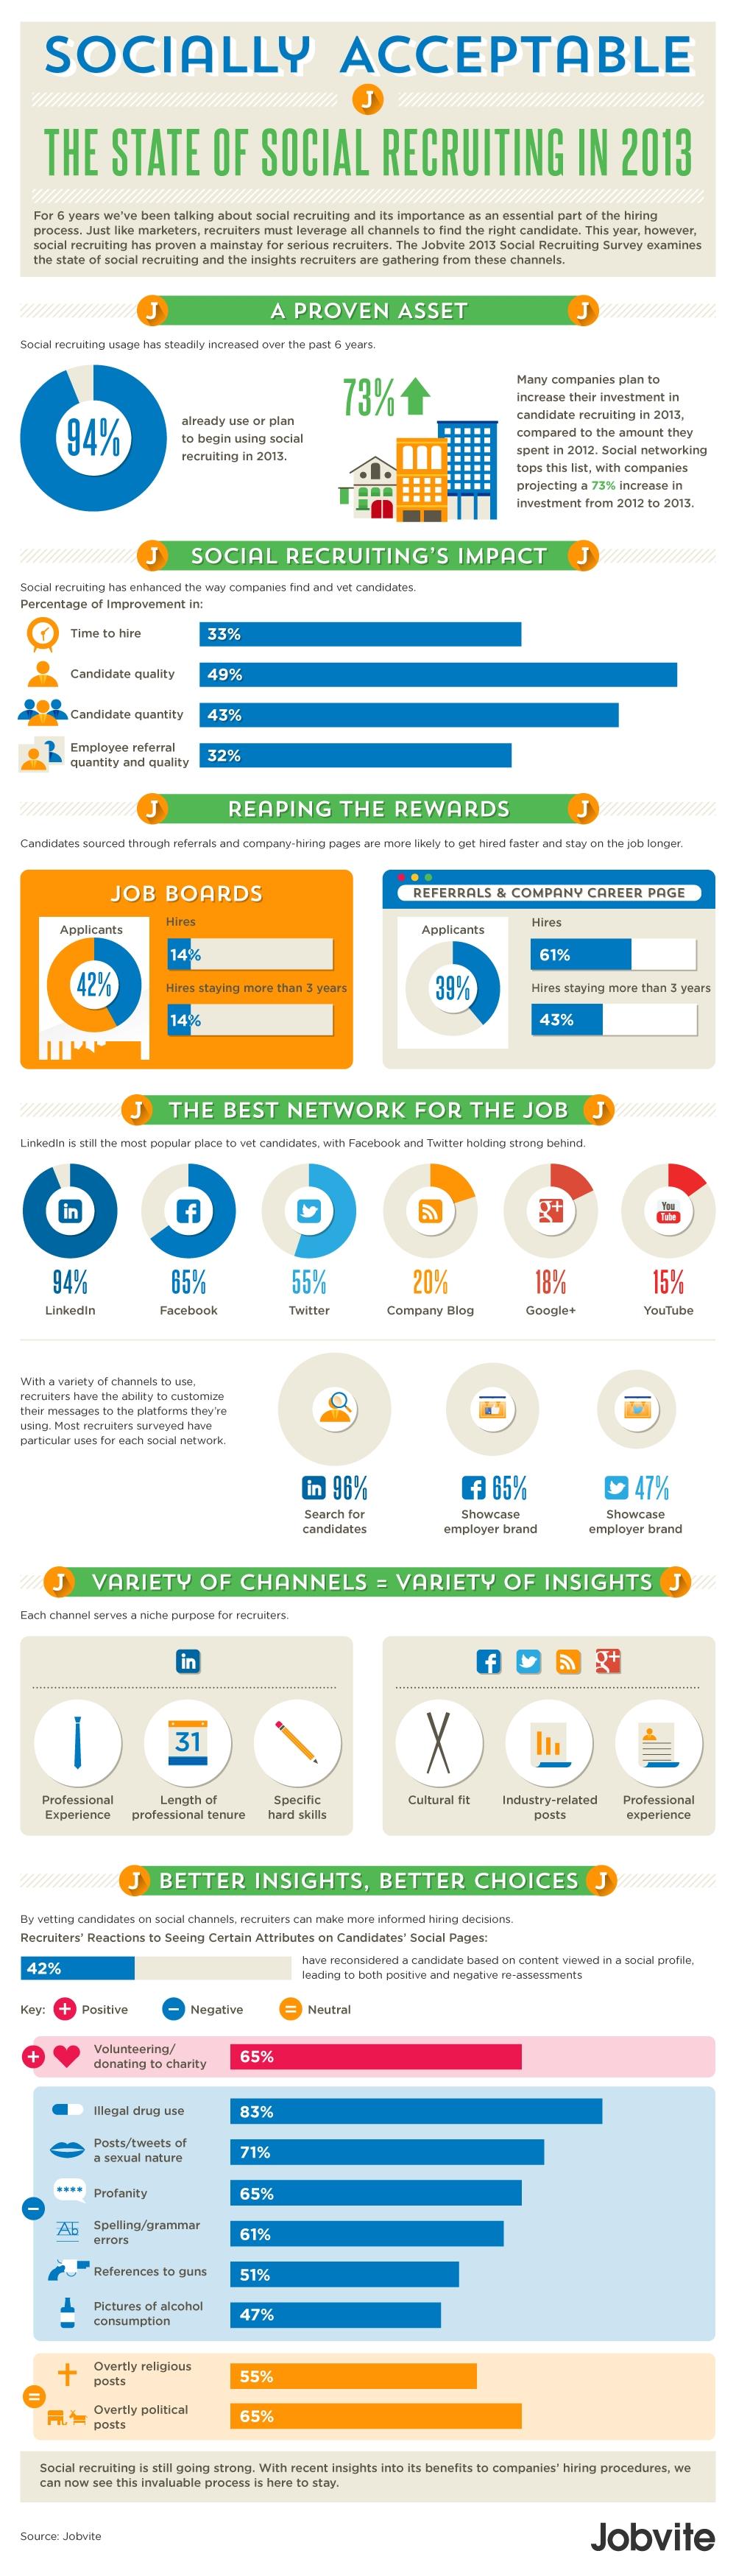 Social Recruiting In 2013 Attracting Potential Employees Through Social Media Social Media Infographic Social Media Recruitment